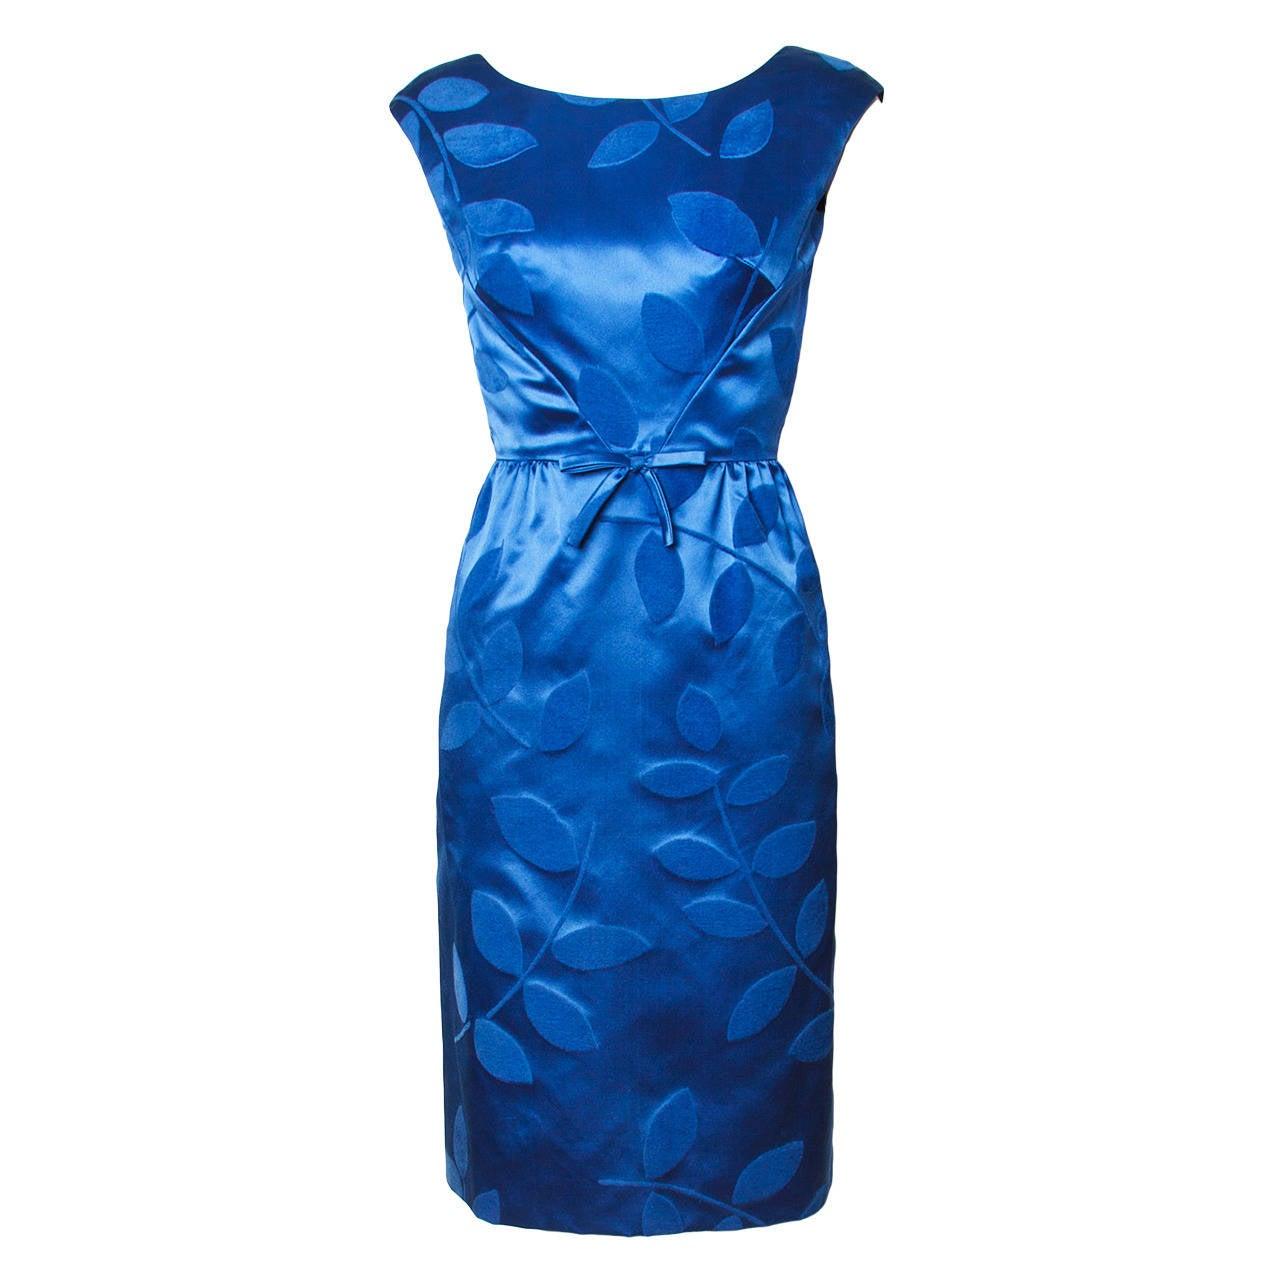 Vintage 1960s Blue Silk Satin Cocktail Dress 1